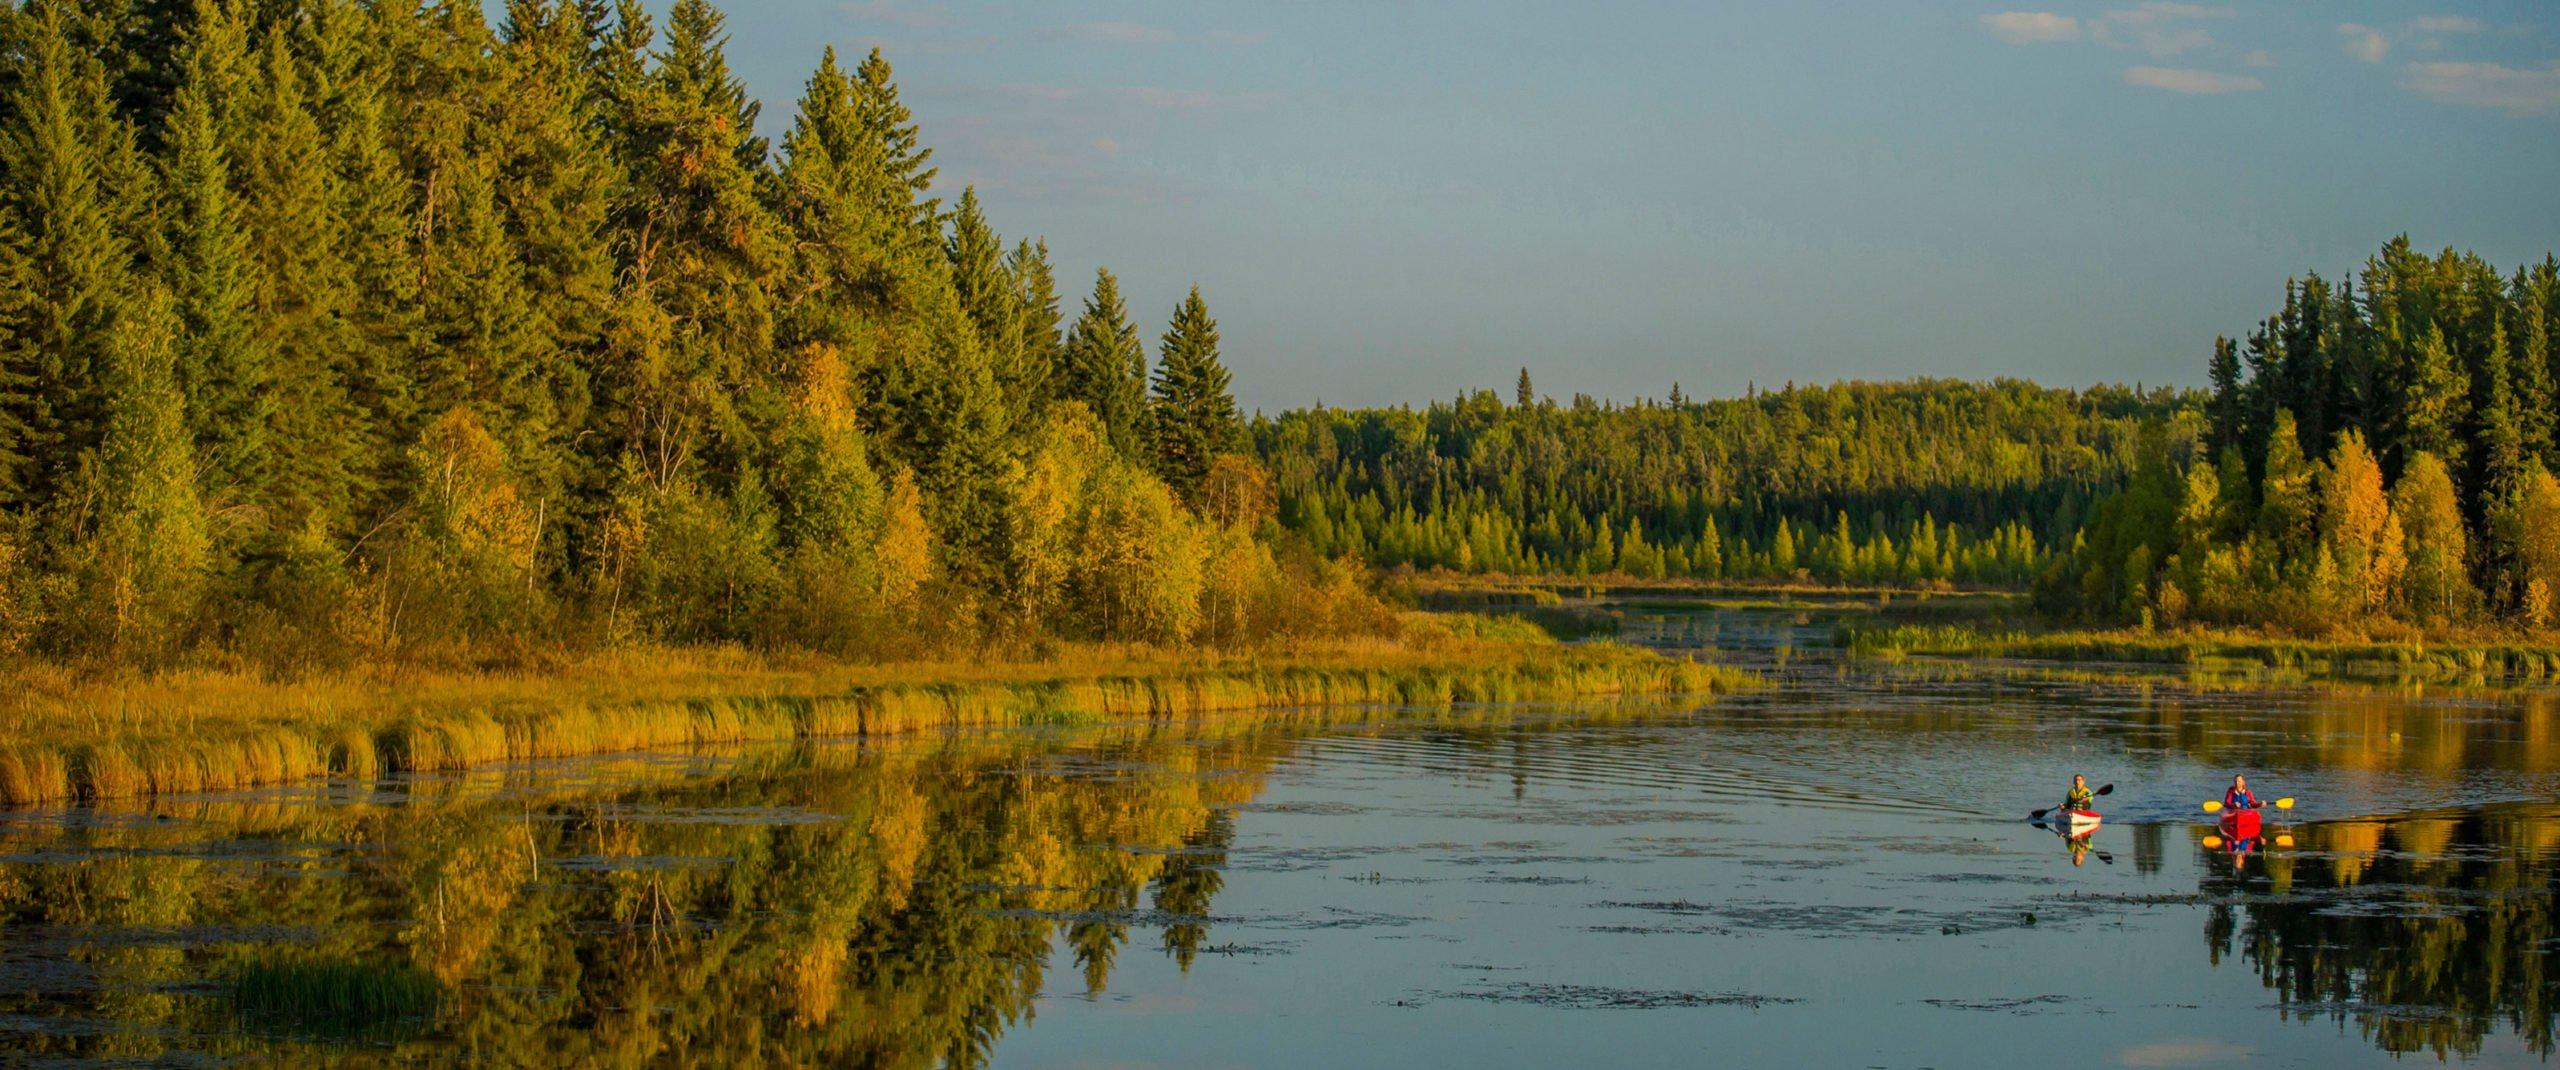 Saskatchewan and Alberta